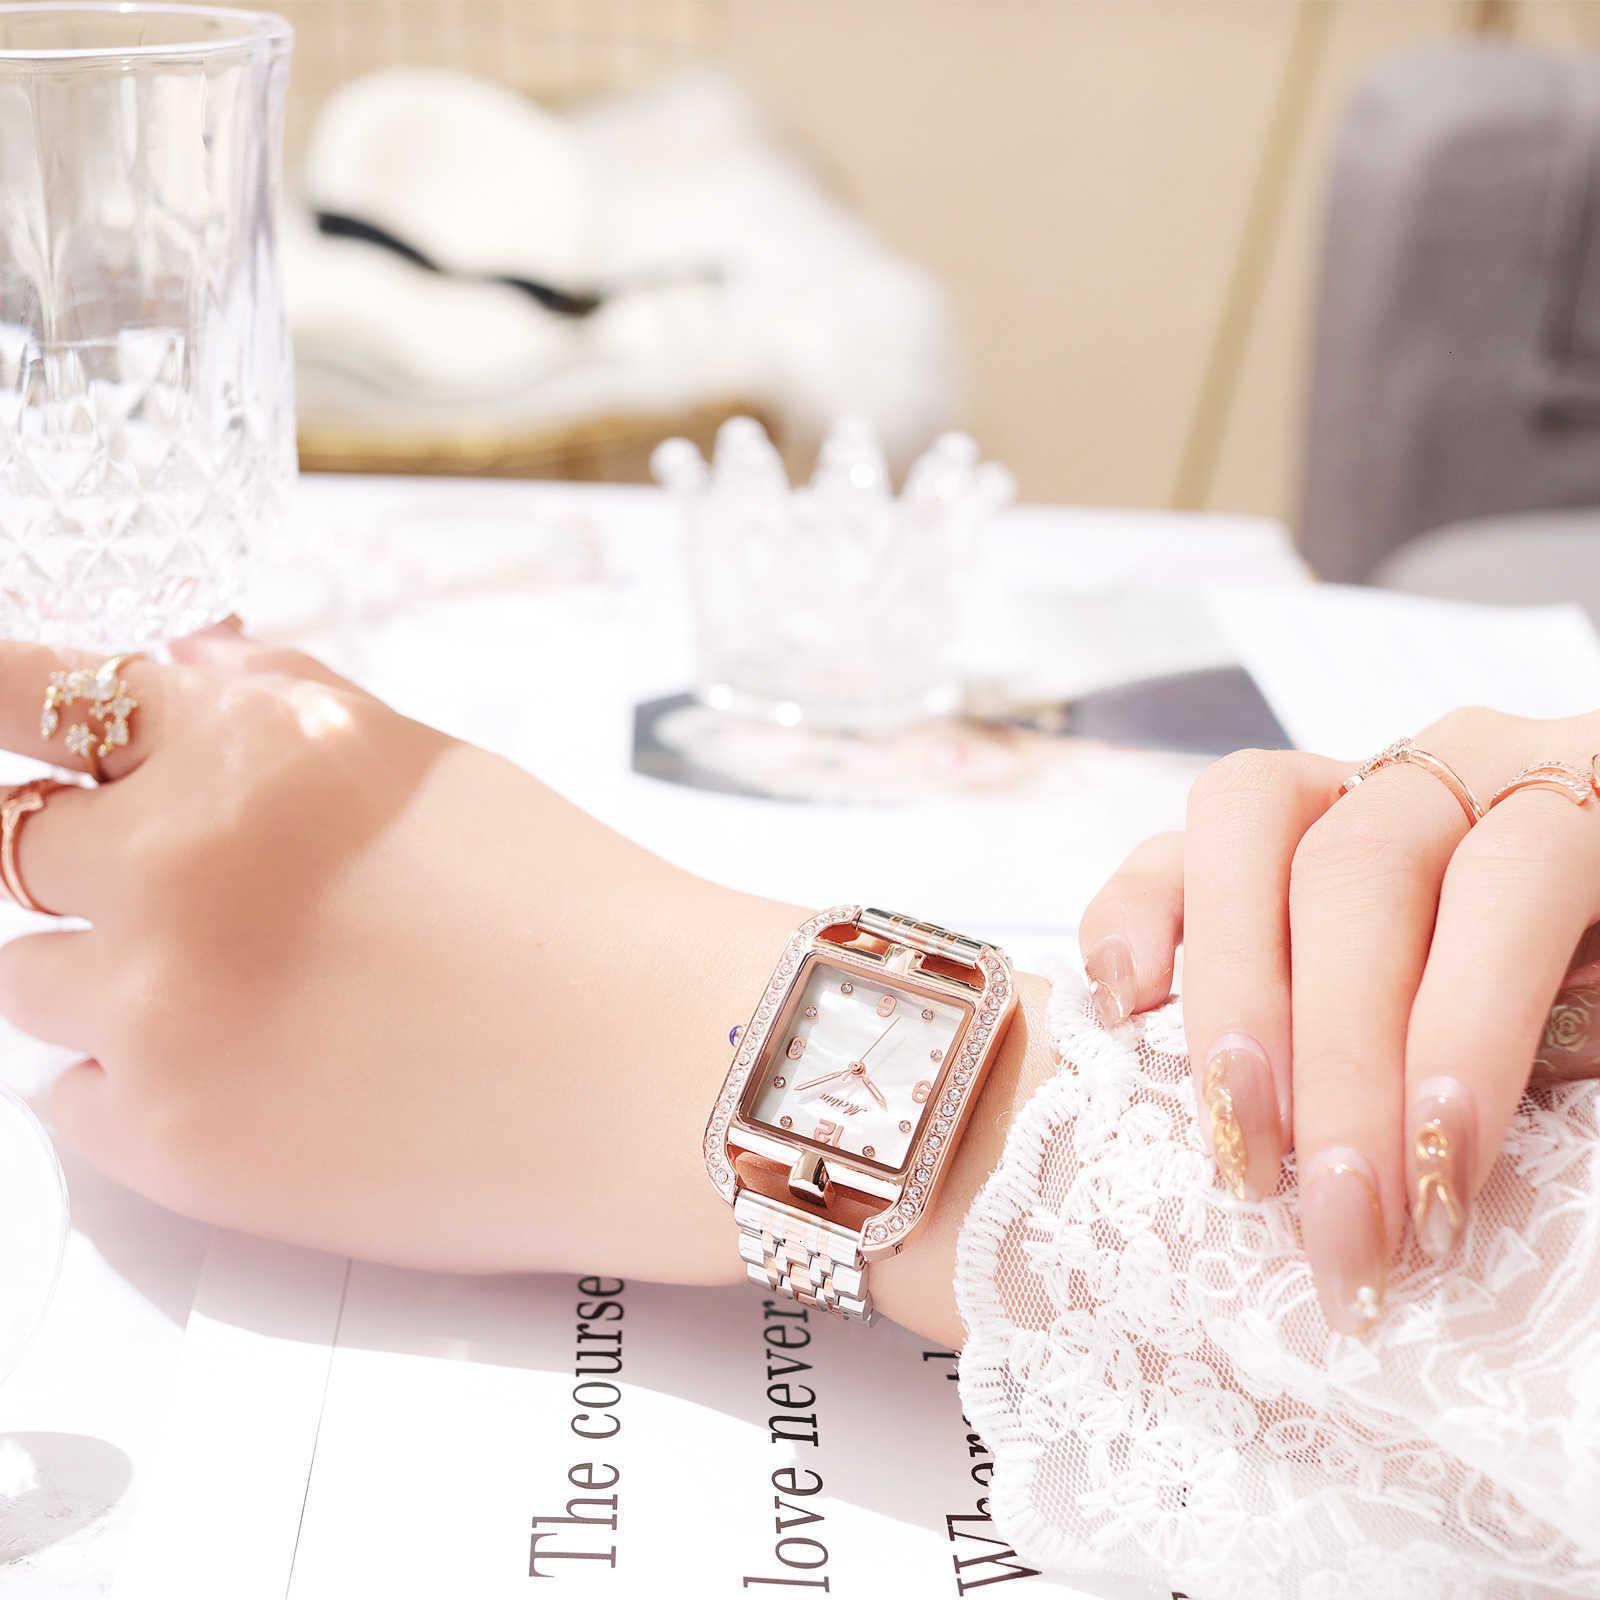 Watch Damen Mode Square Meibin Digital Face Quarzuhr